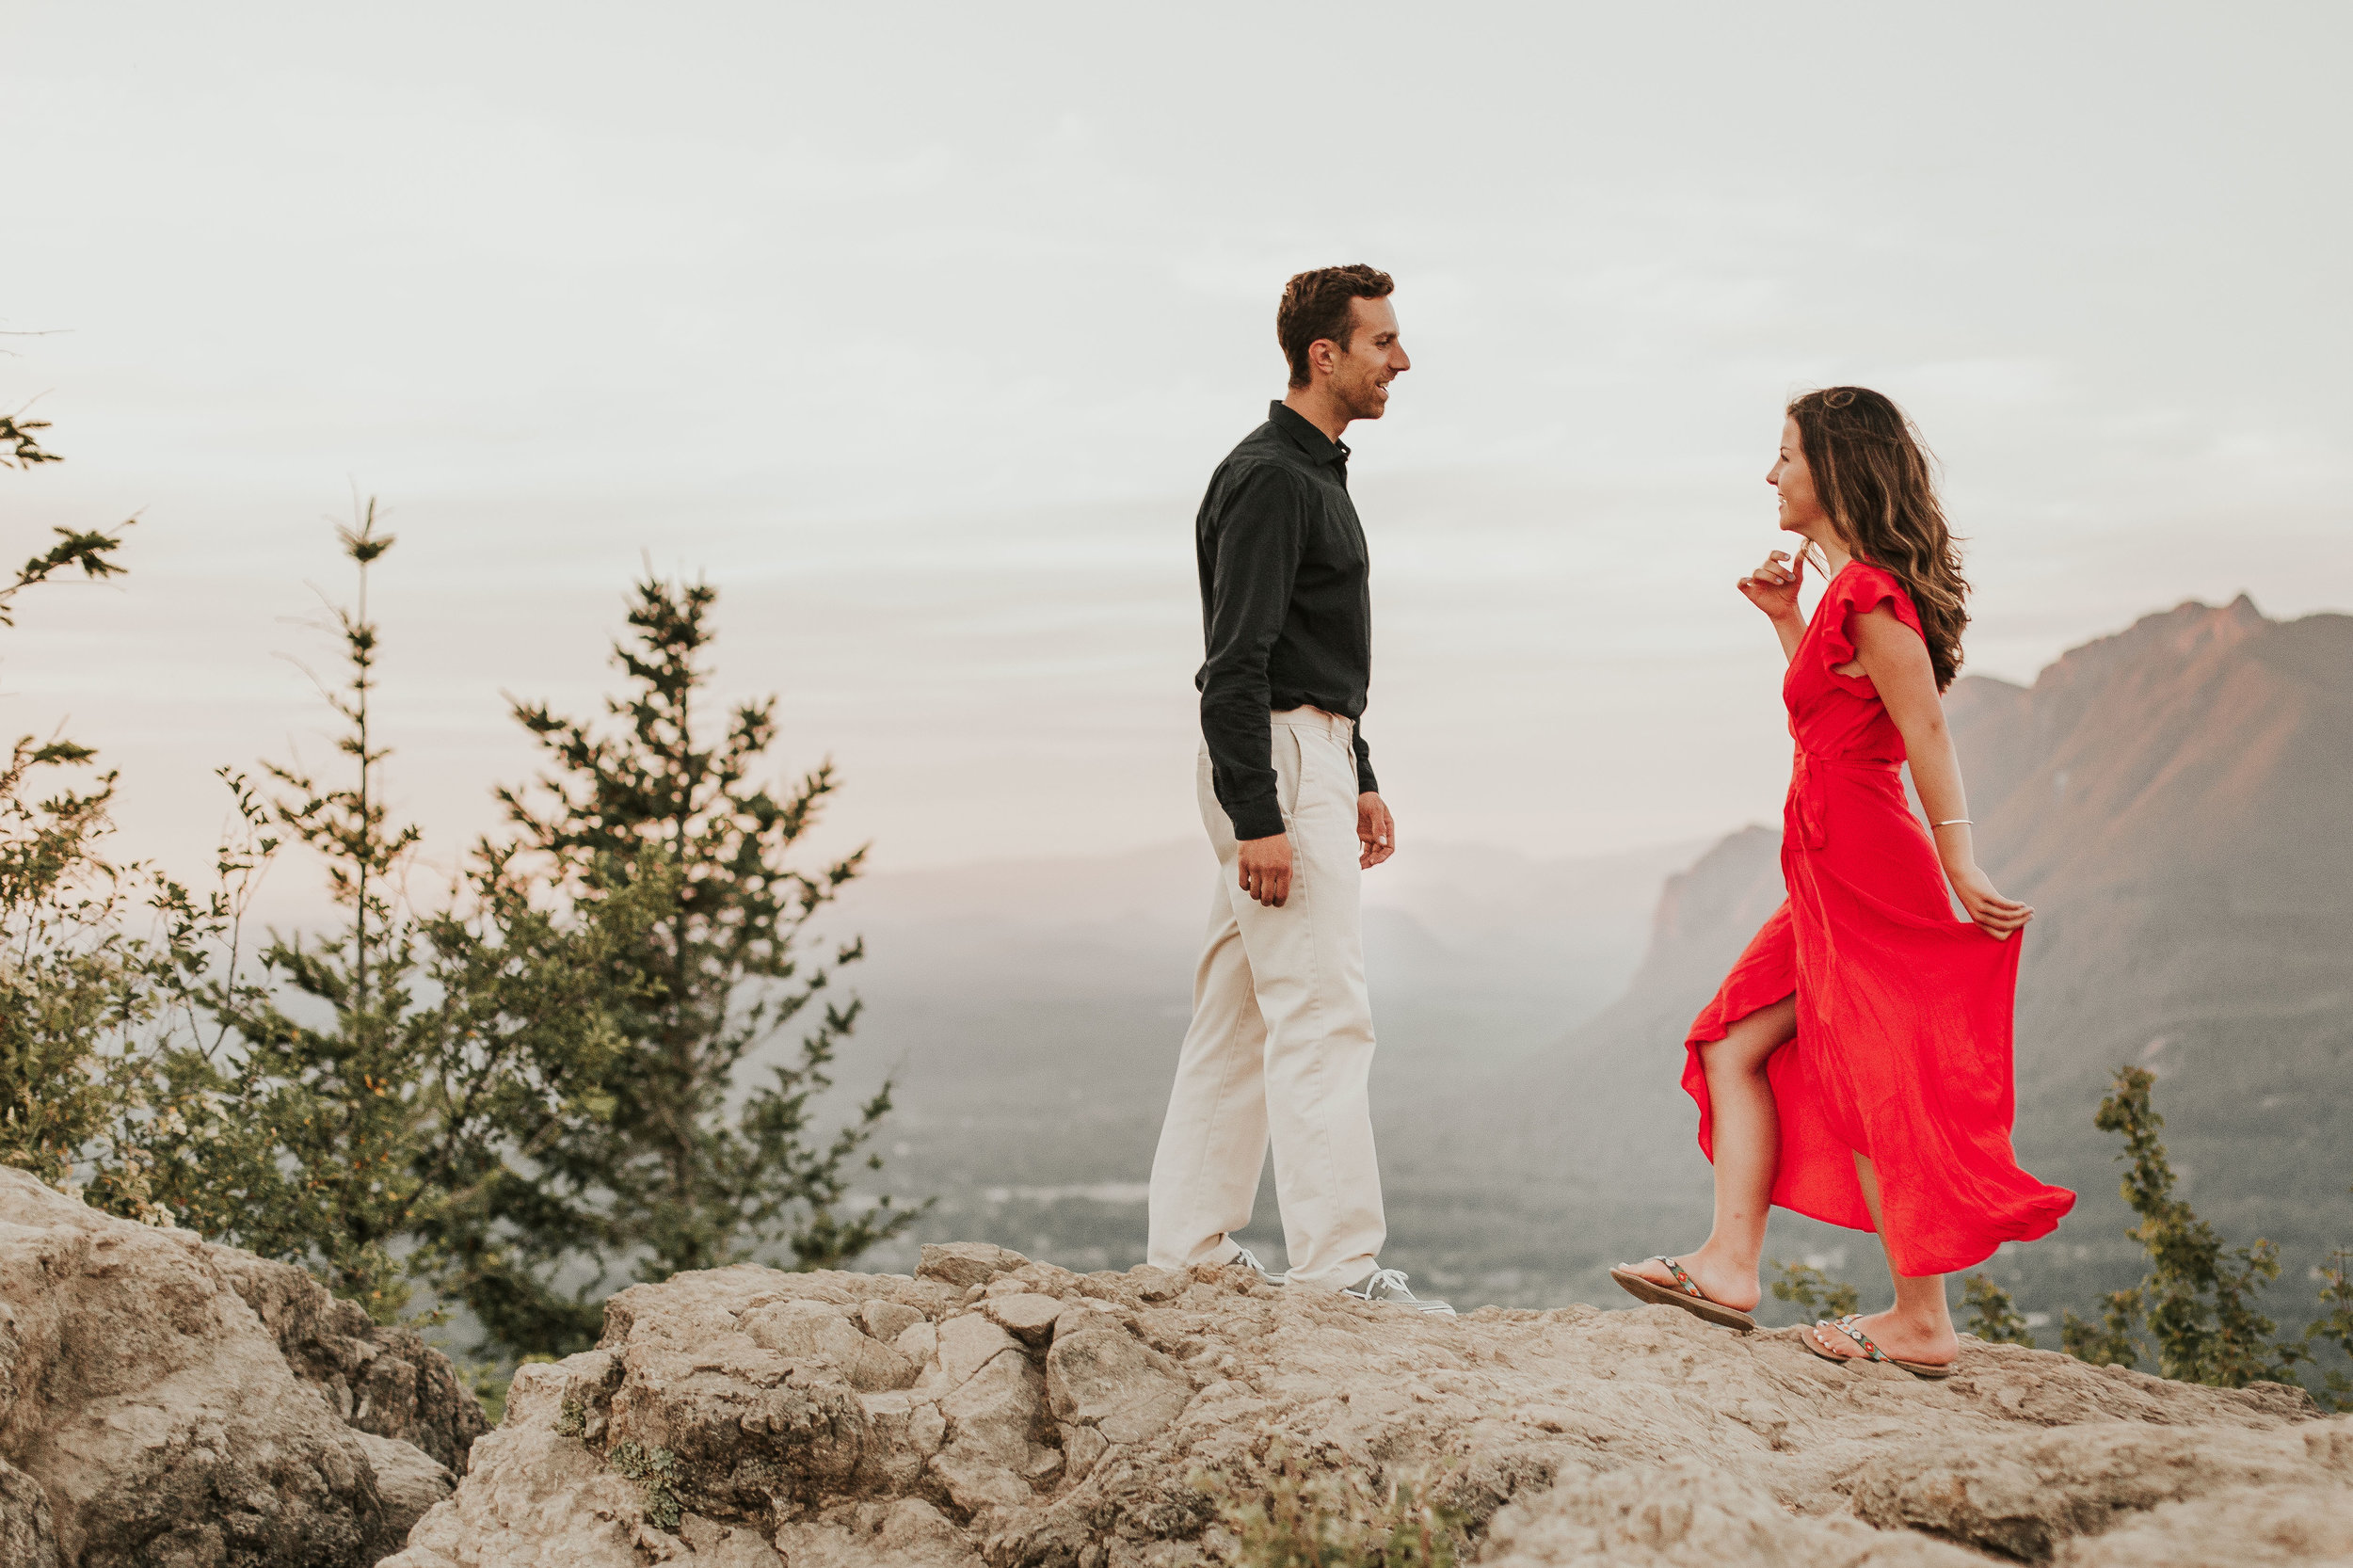 nicole-daacke-photography-rattlesnake-ridge-adventurous-engagement-session-hiking-seattle-washington-destinatino-elopement-intimate-wedding-photographer-17.jpg